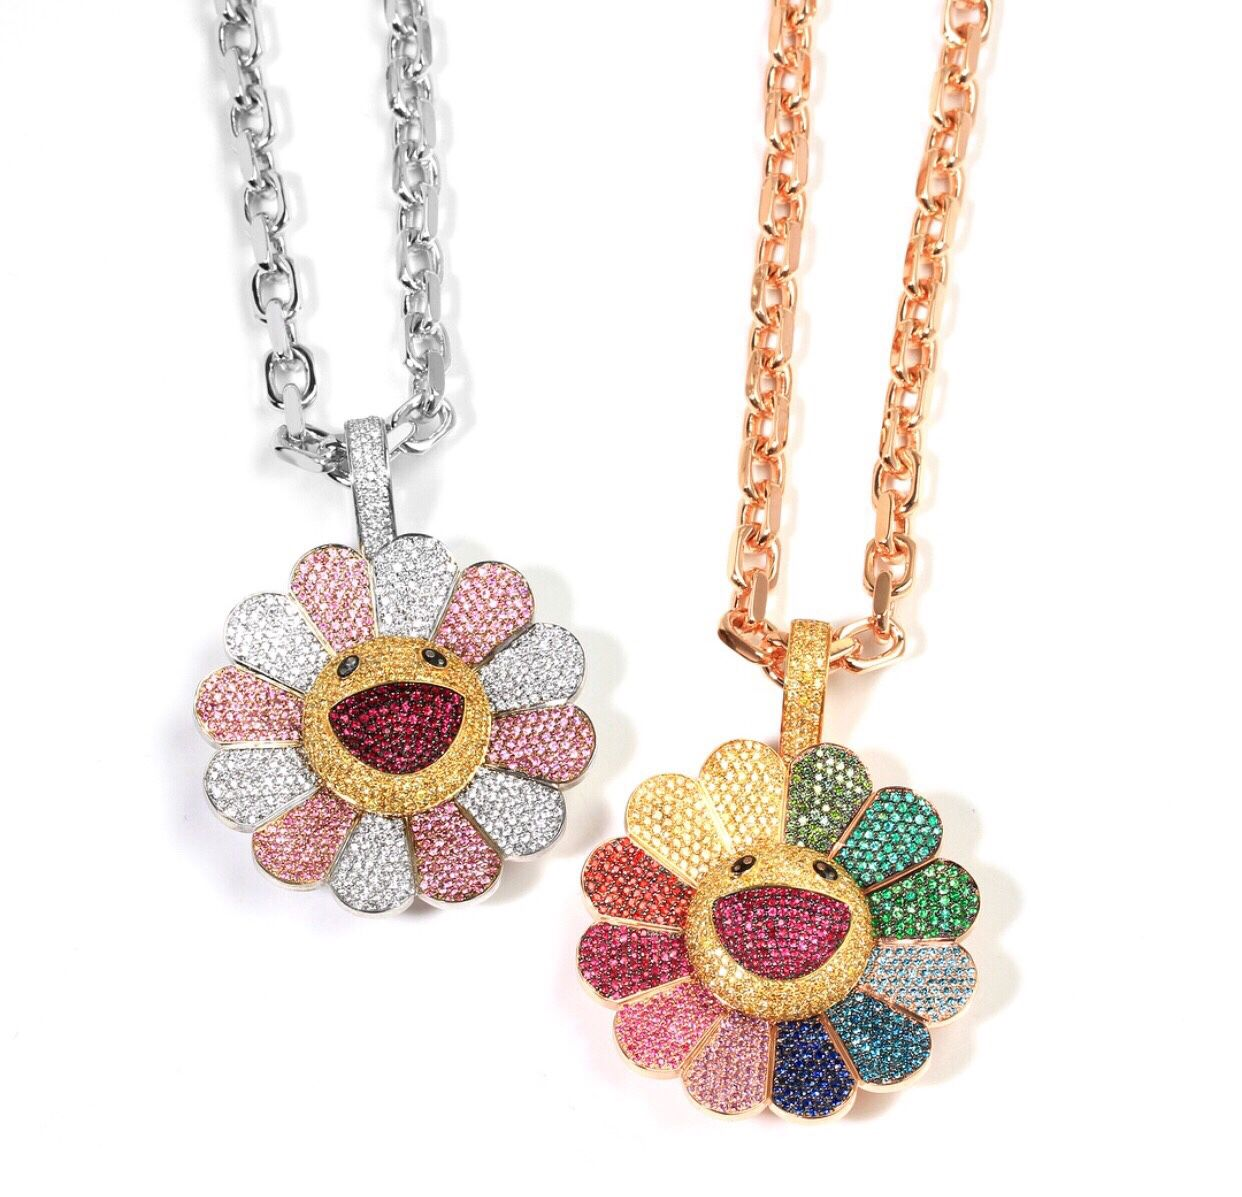 Takashi murakami custom spinning flowers pendant necklace are now takashi murakami custom spinning flowers pendant necklace are now live on https mozeypictures Gallery